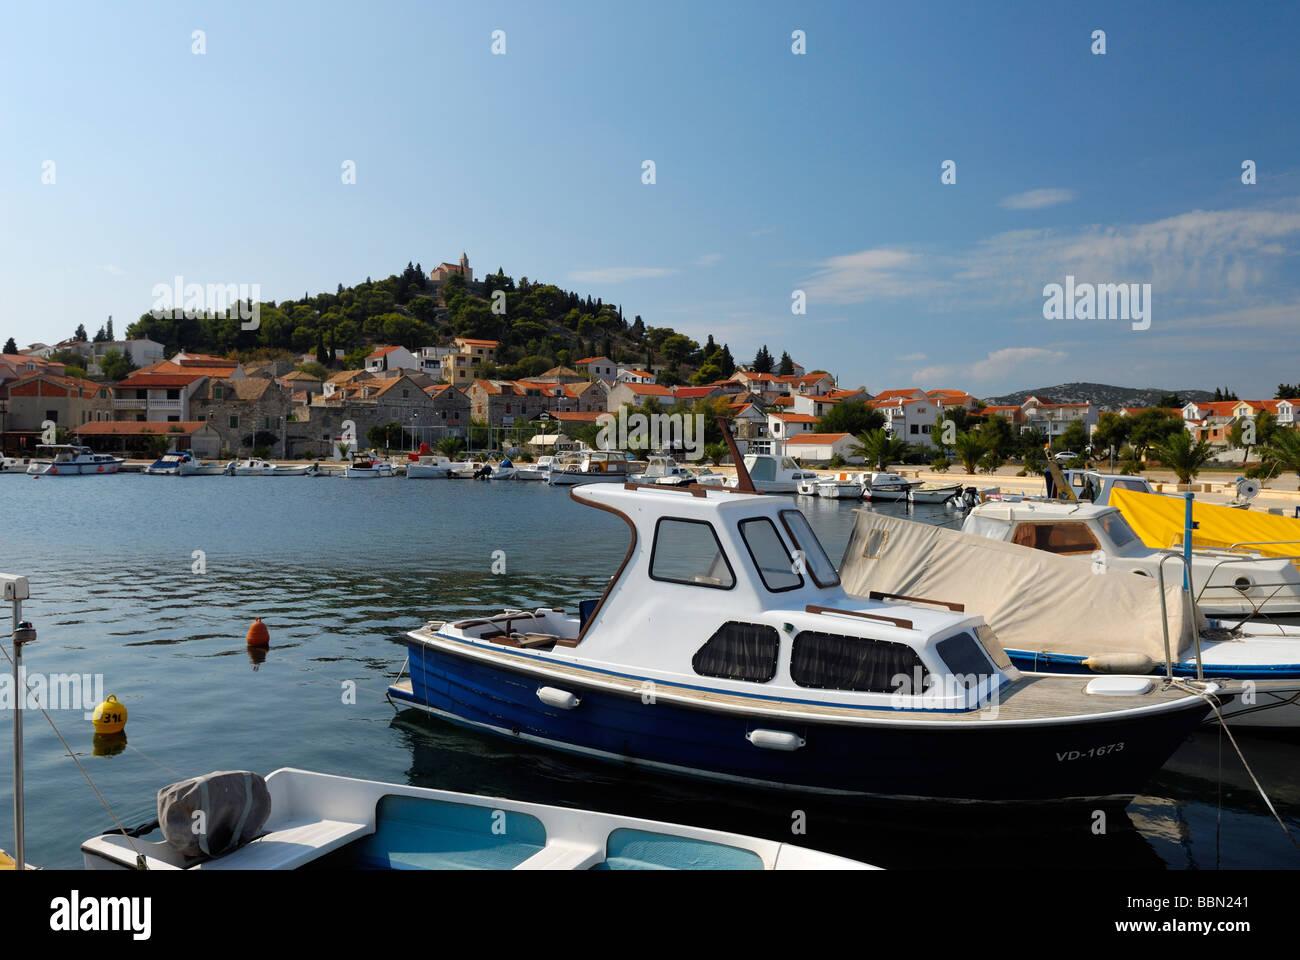 Picturesque town of Tribunj on Dalmatian Coast of Croatia - Stock Image